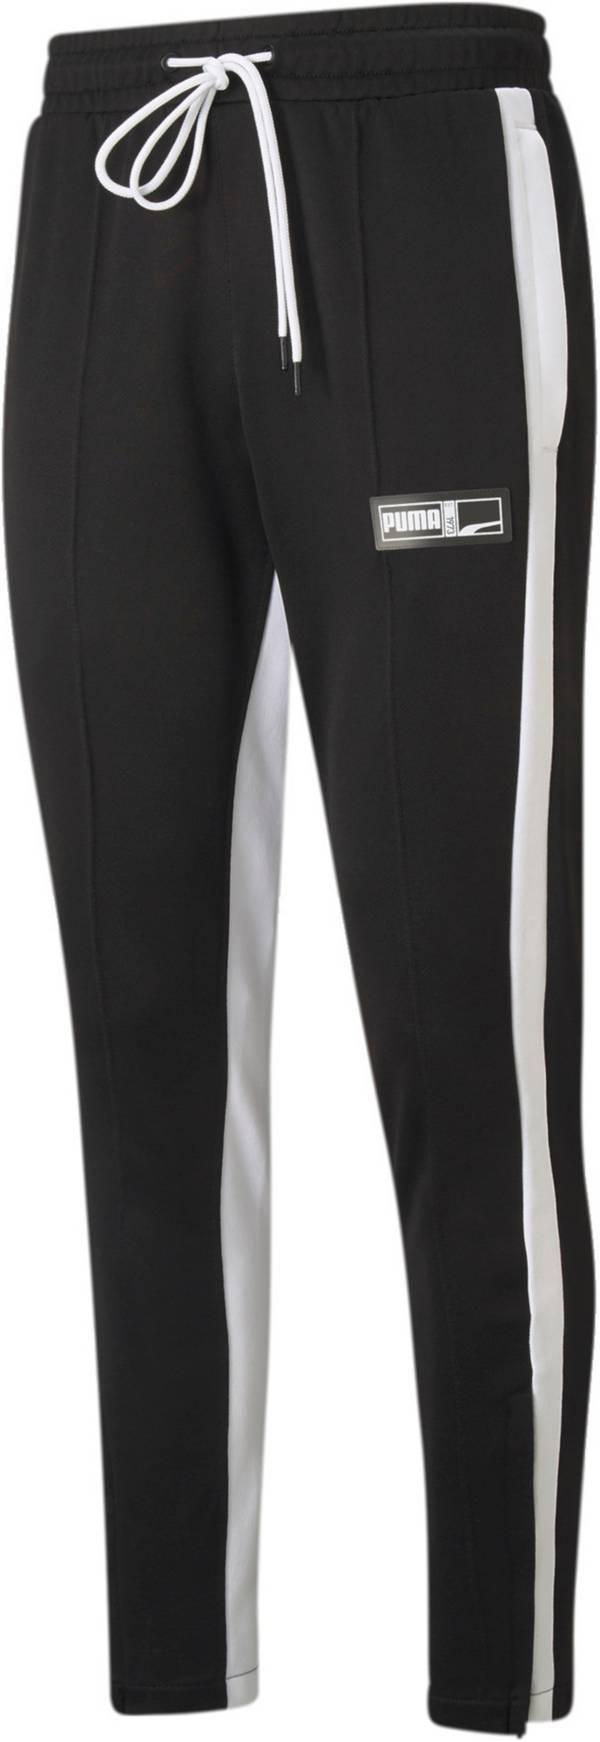 PUMA Men's Trackstar Basketball Pants product image